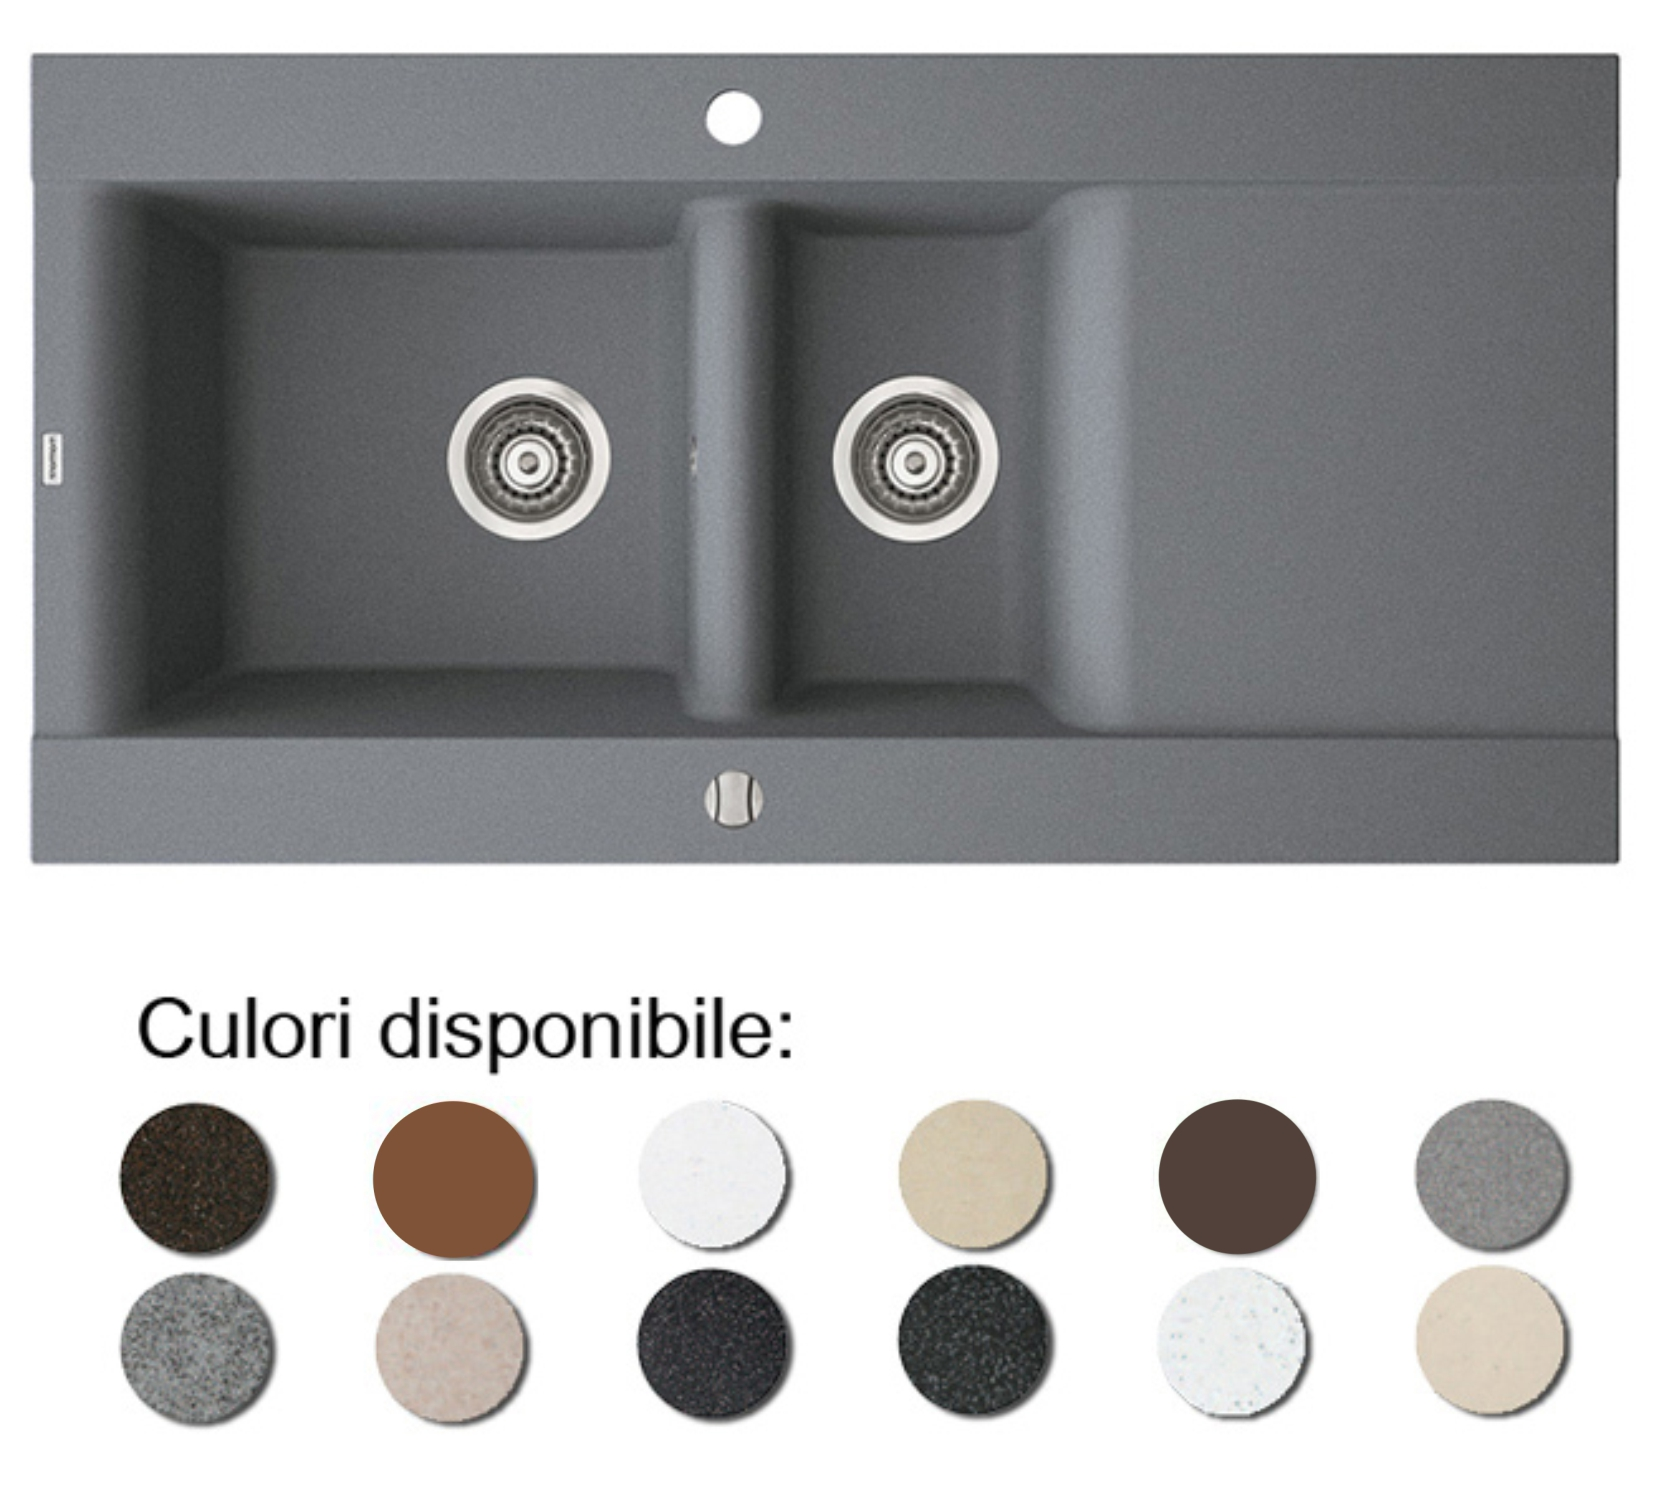 Poza Chiuveta Bucatarie Granit Compozit Anticalcar Cuve Picurator